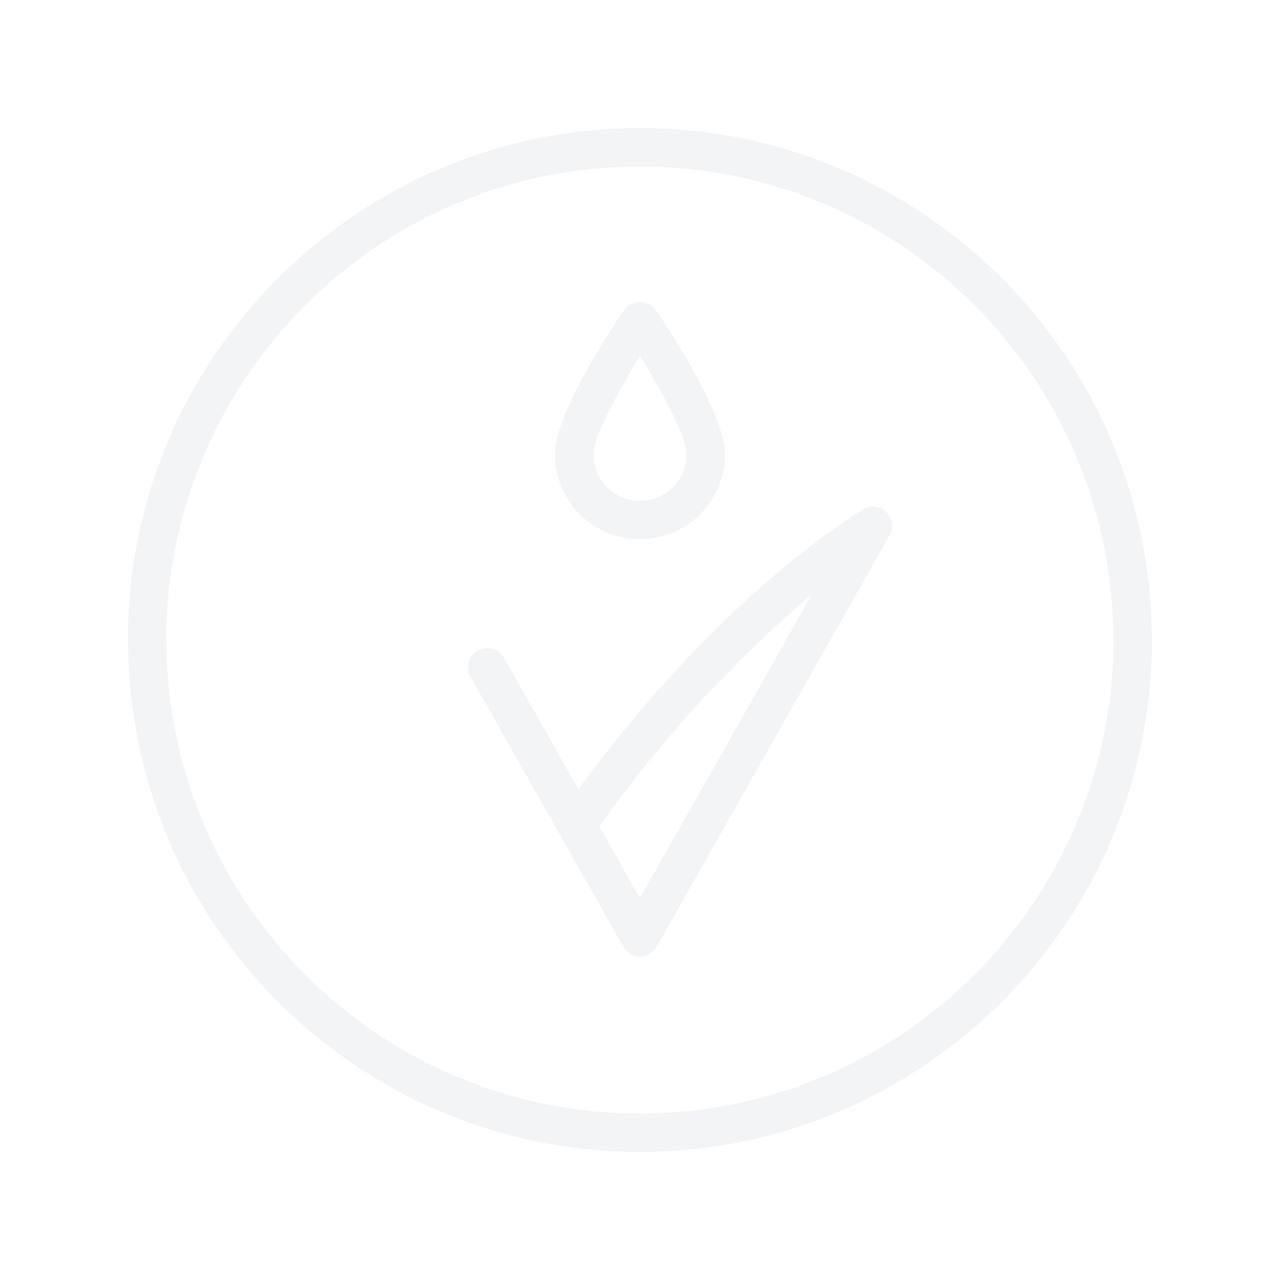 DIOR Diorshow Iconic Overcurl Gift Set